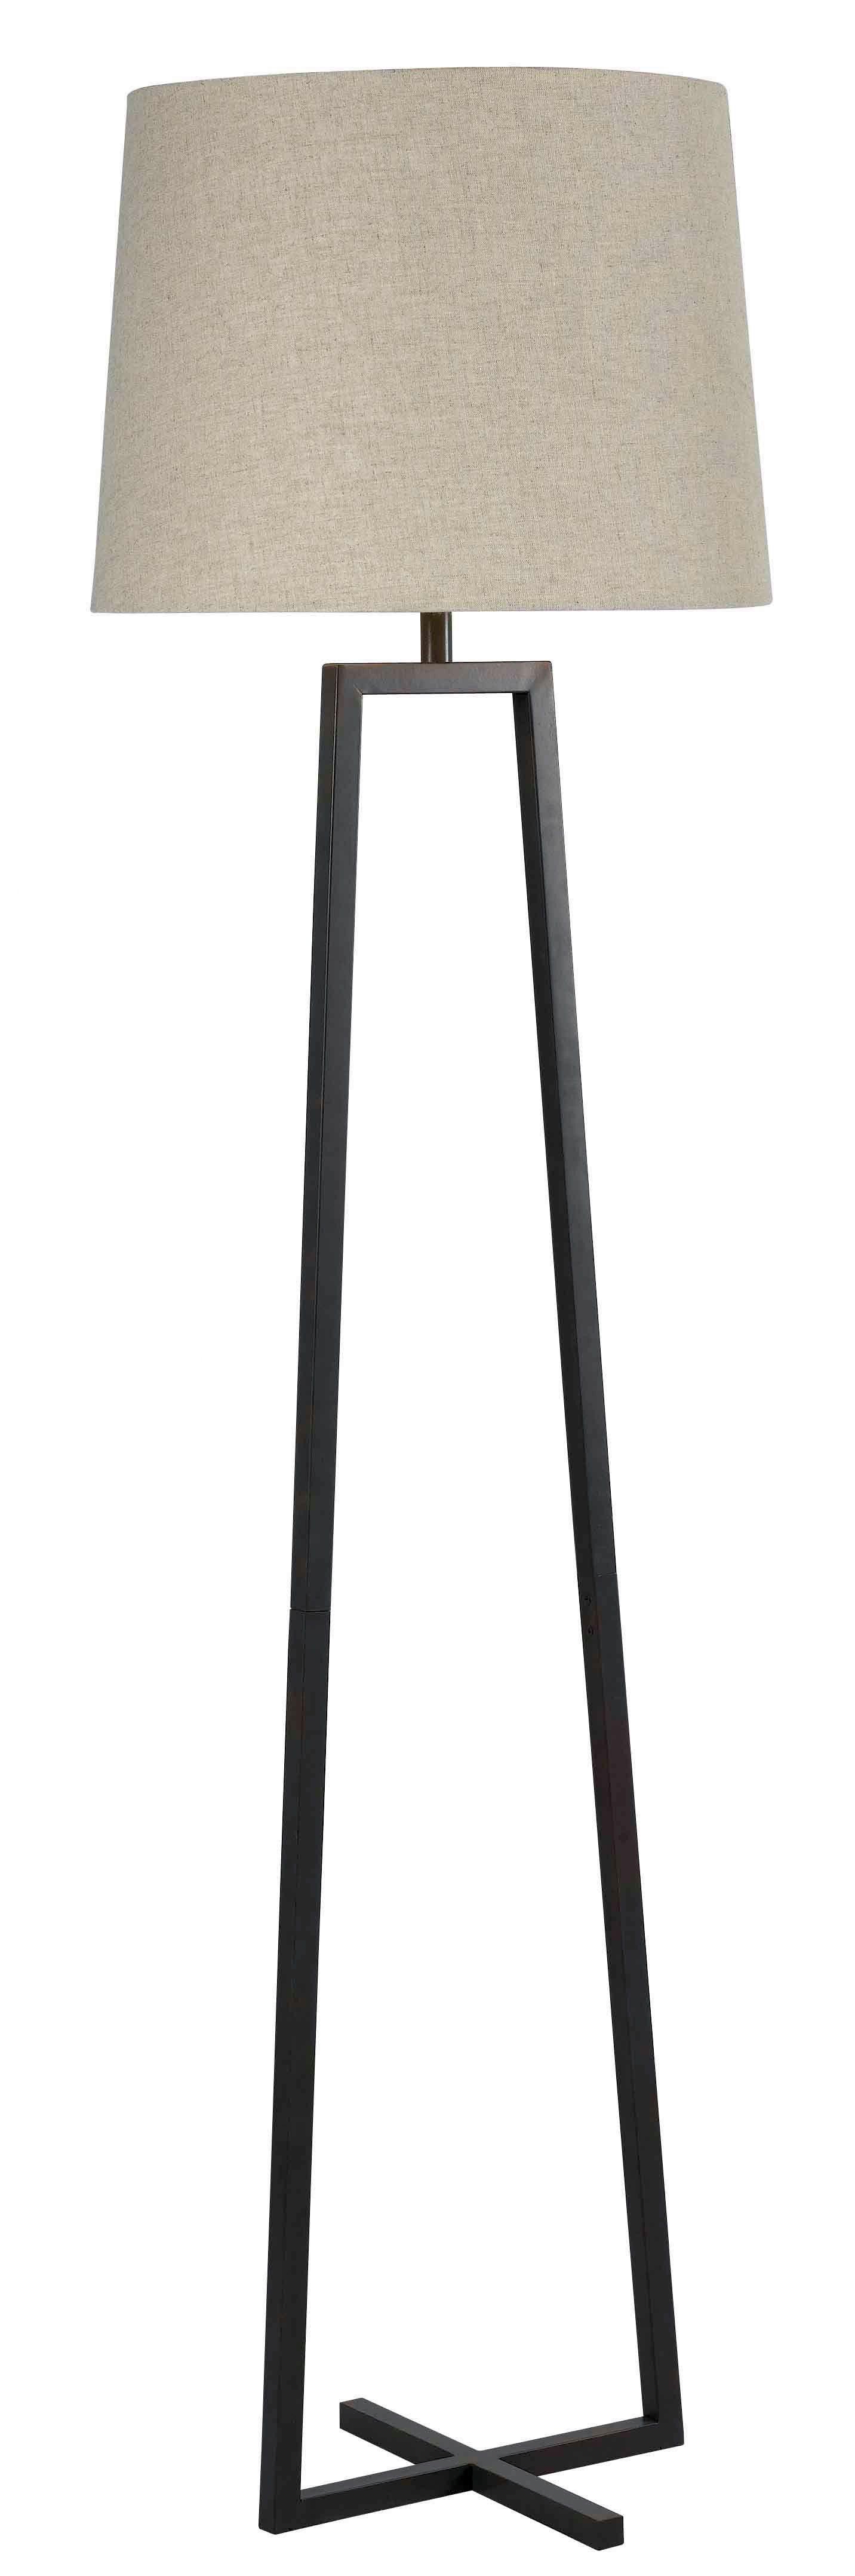 Kenroy Home Ranger Floor Lamp In Oil Rubbed Bronze Floor Lamp Floor Lamp Bedroom Floor Lamps Living Room